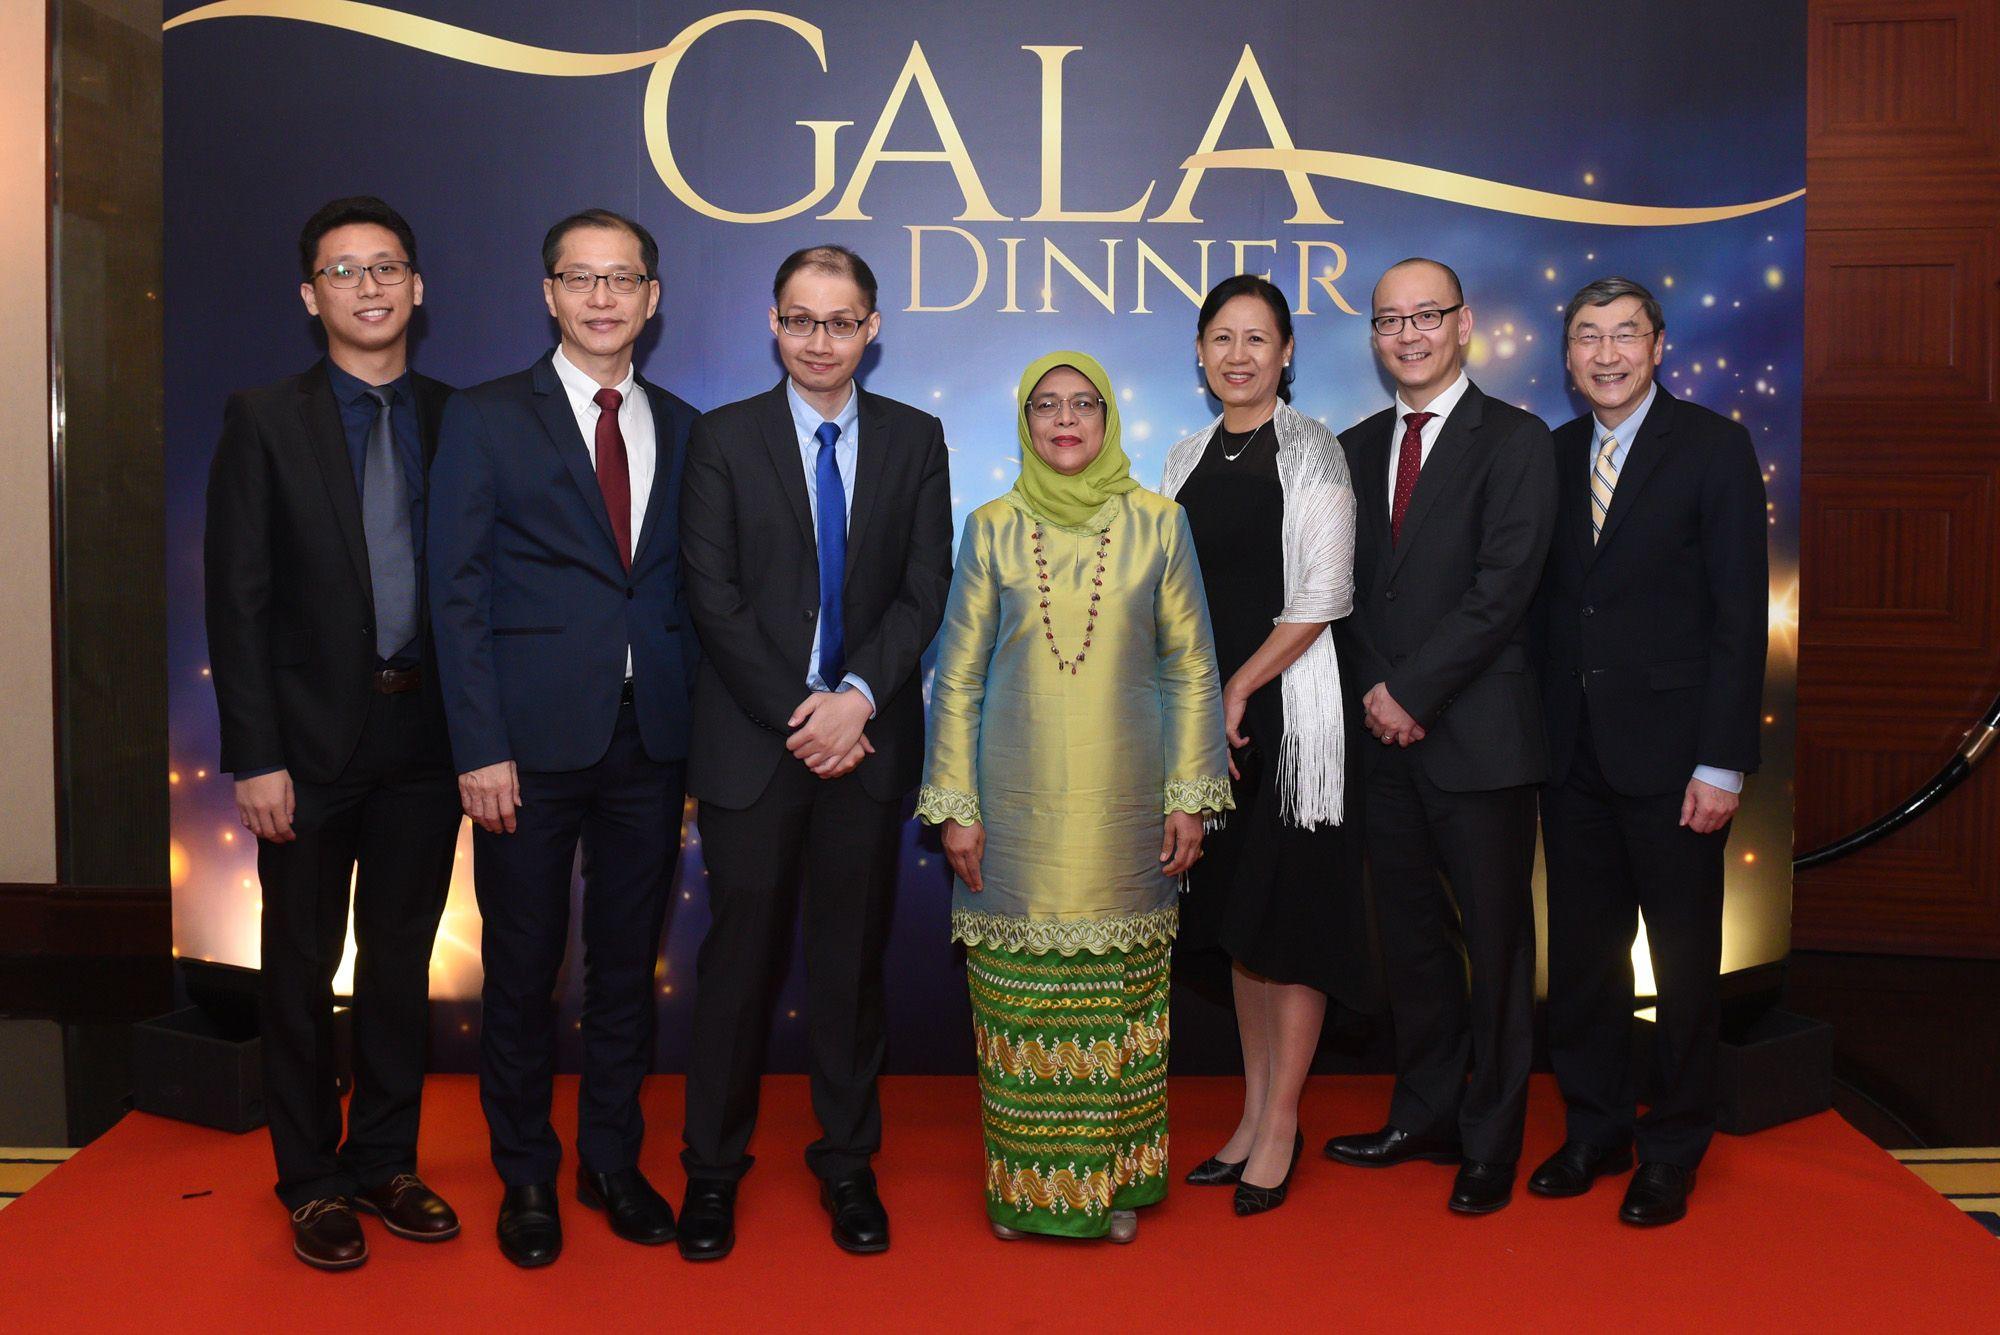 Lee Jie Long, Roger Lee, Joseph Lee, Halimah Yacob, Veron Ang, Chng Wee Joo, John Eu-Li Wong